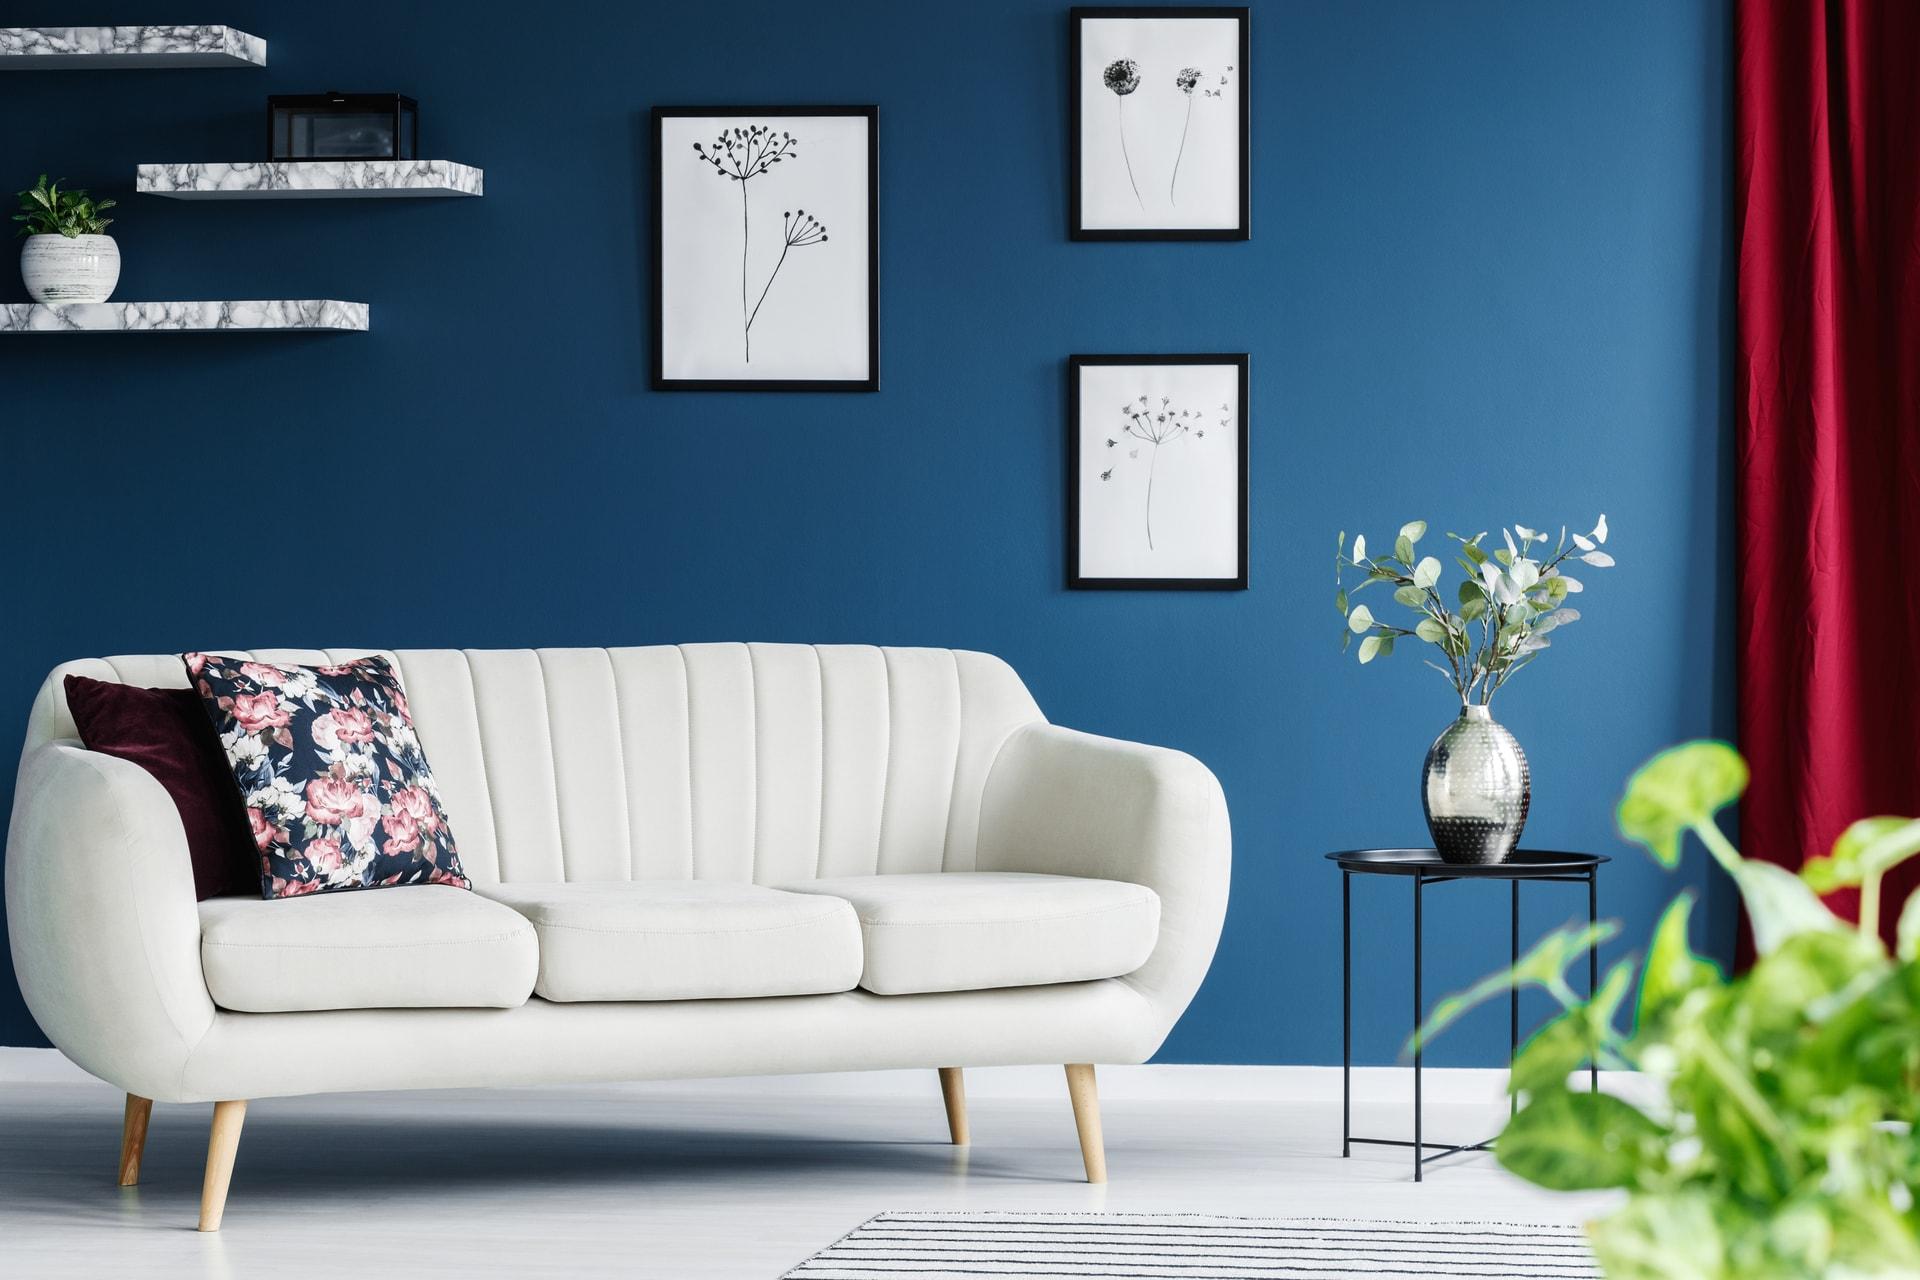 Most Popular sofa styles